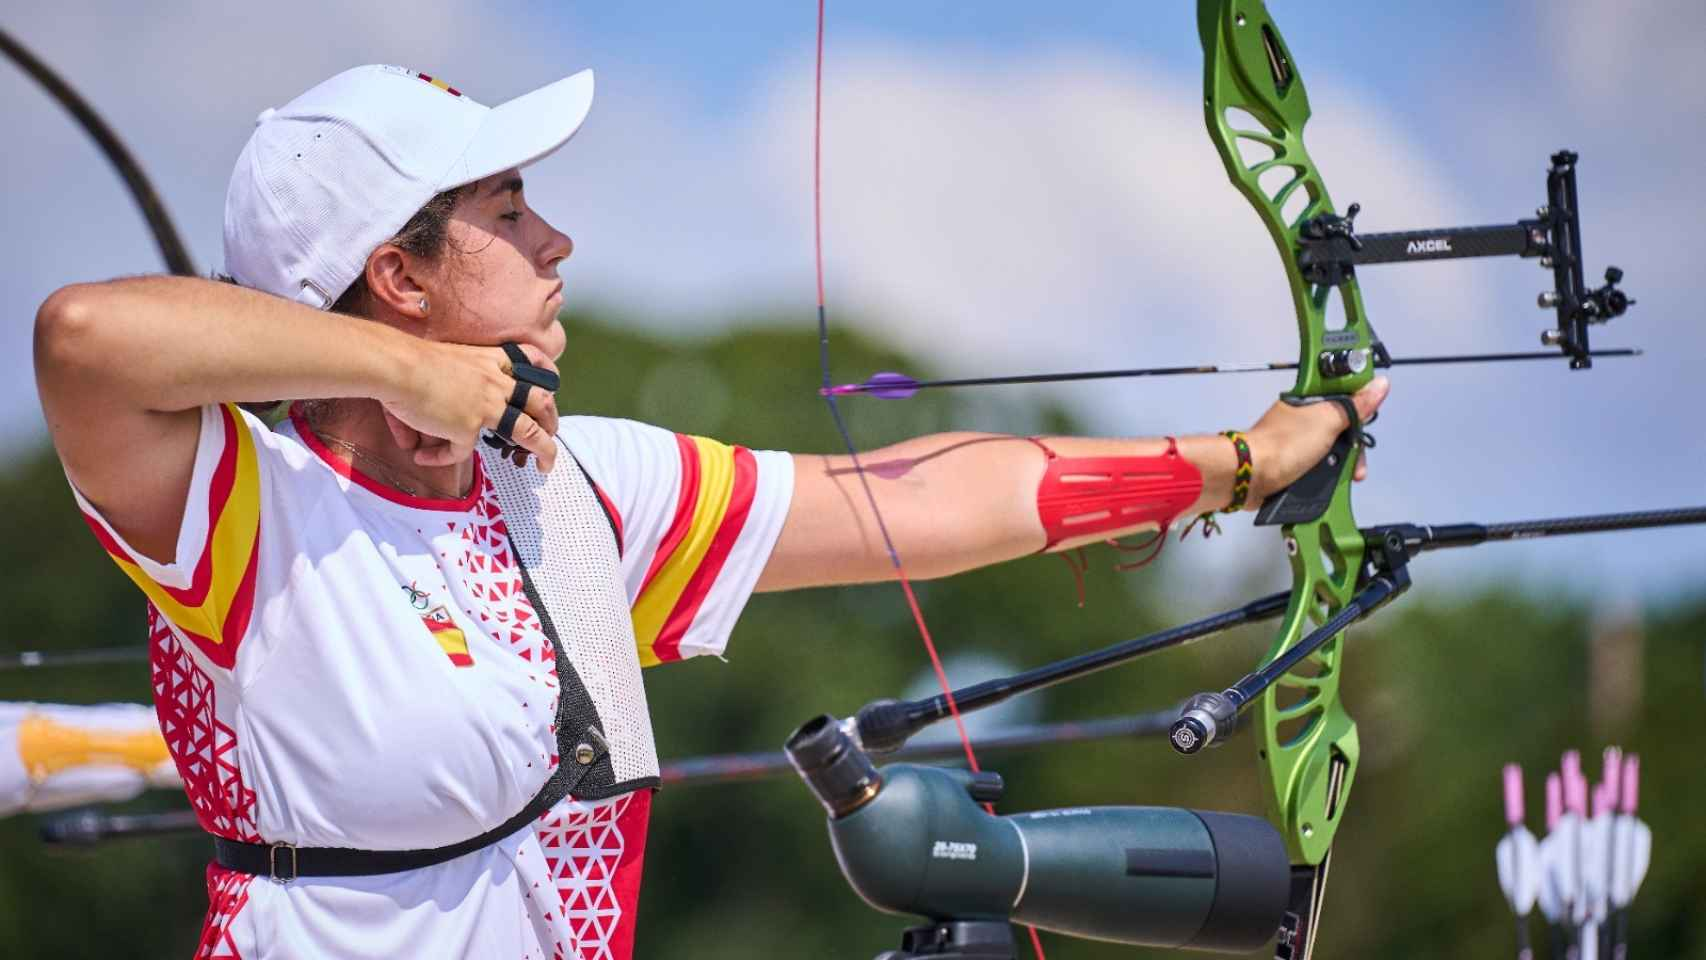 Inés de Velasco en los Juegos Olímpicos de Tokio 2020 en tiro con arco